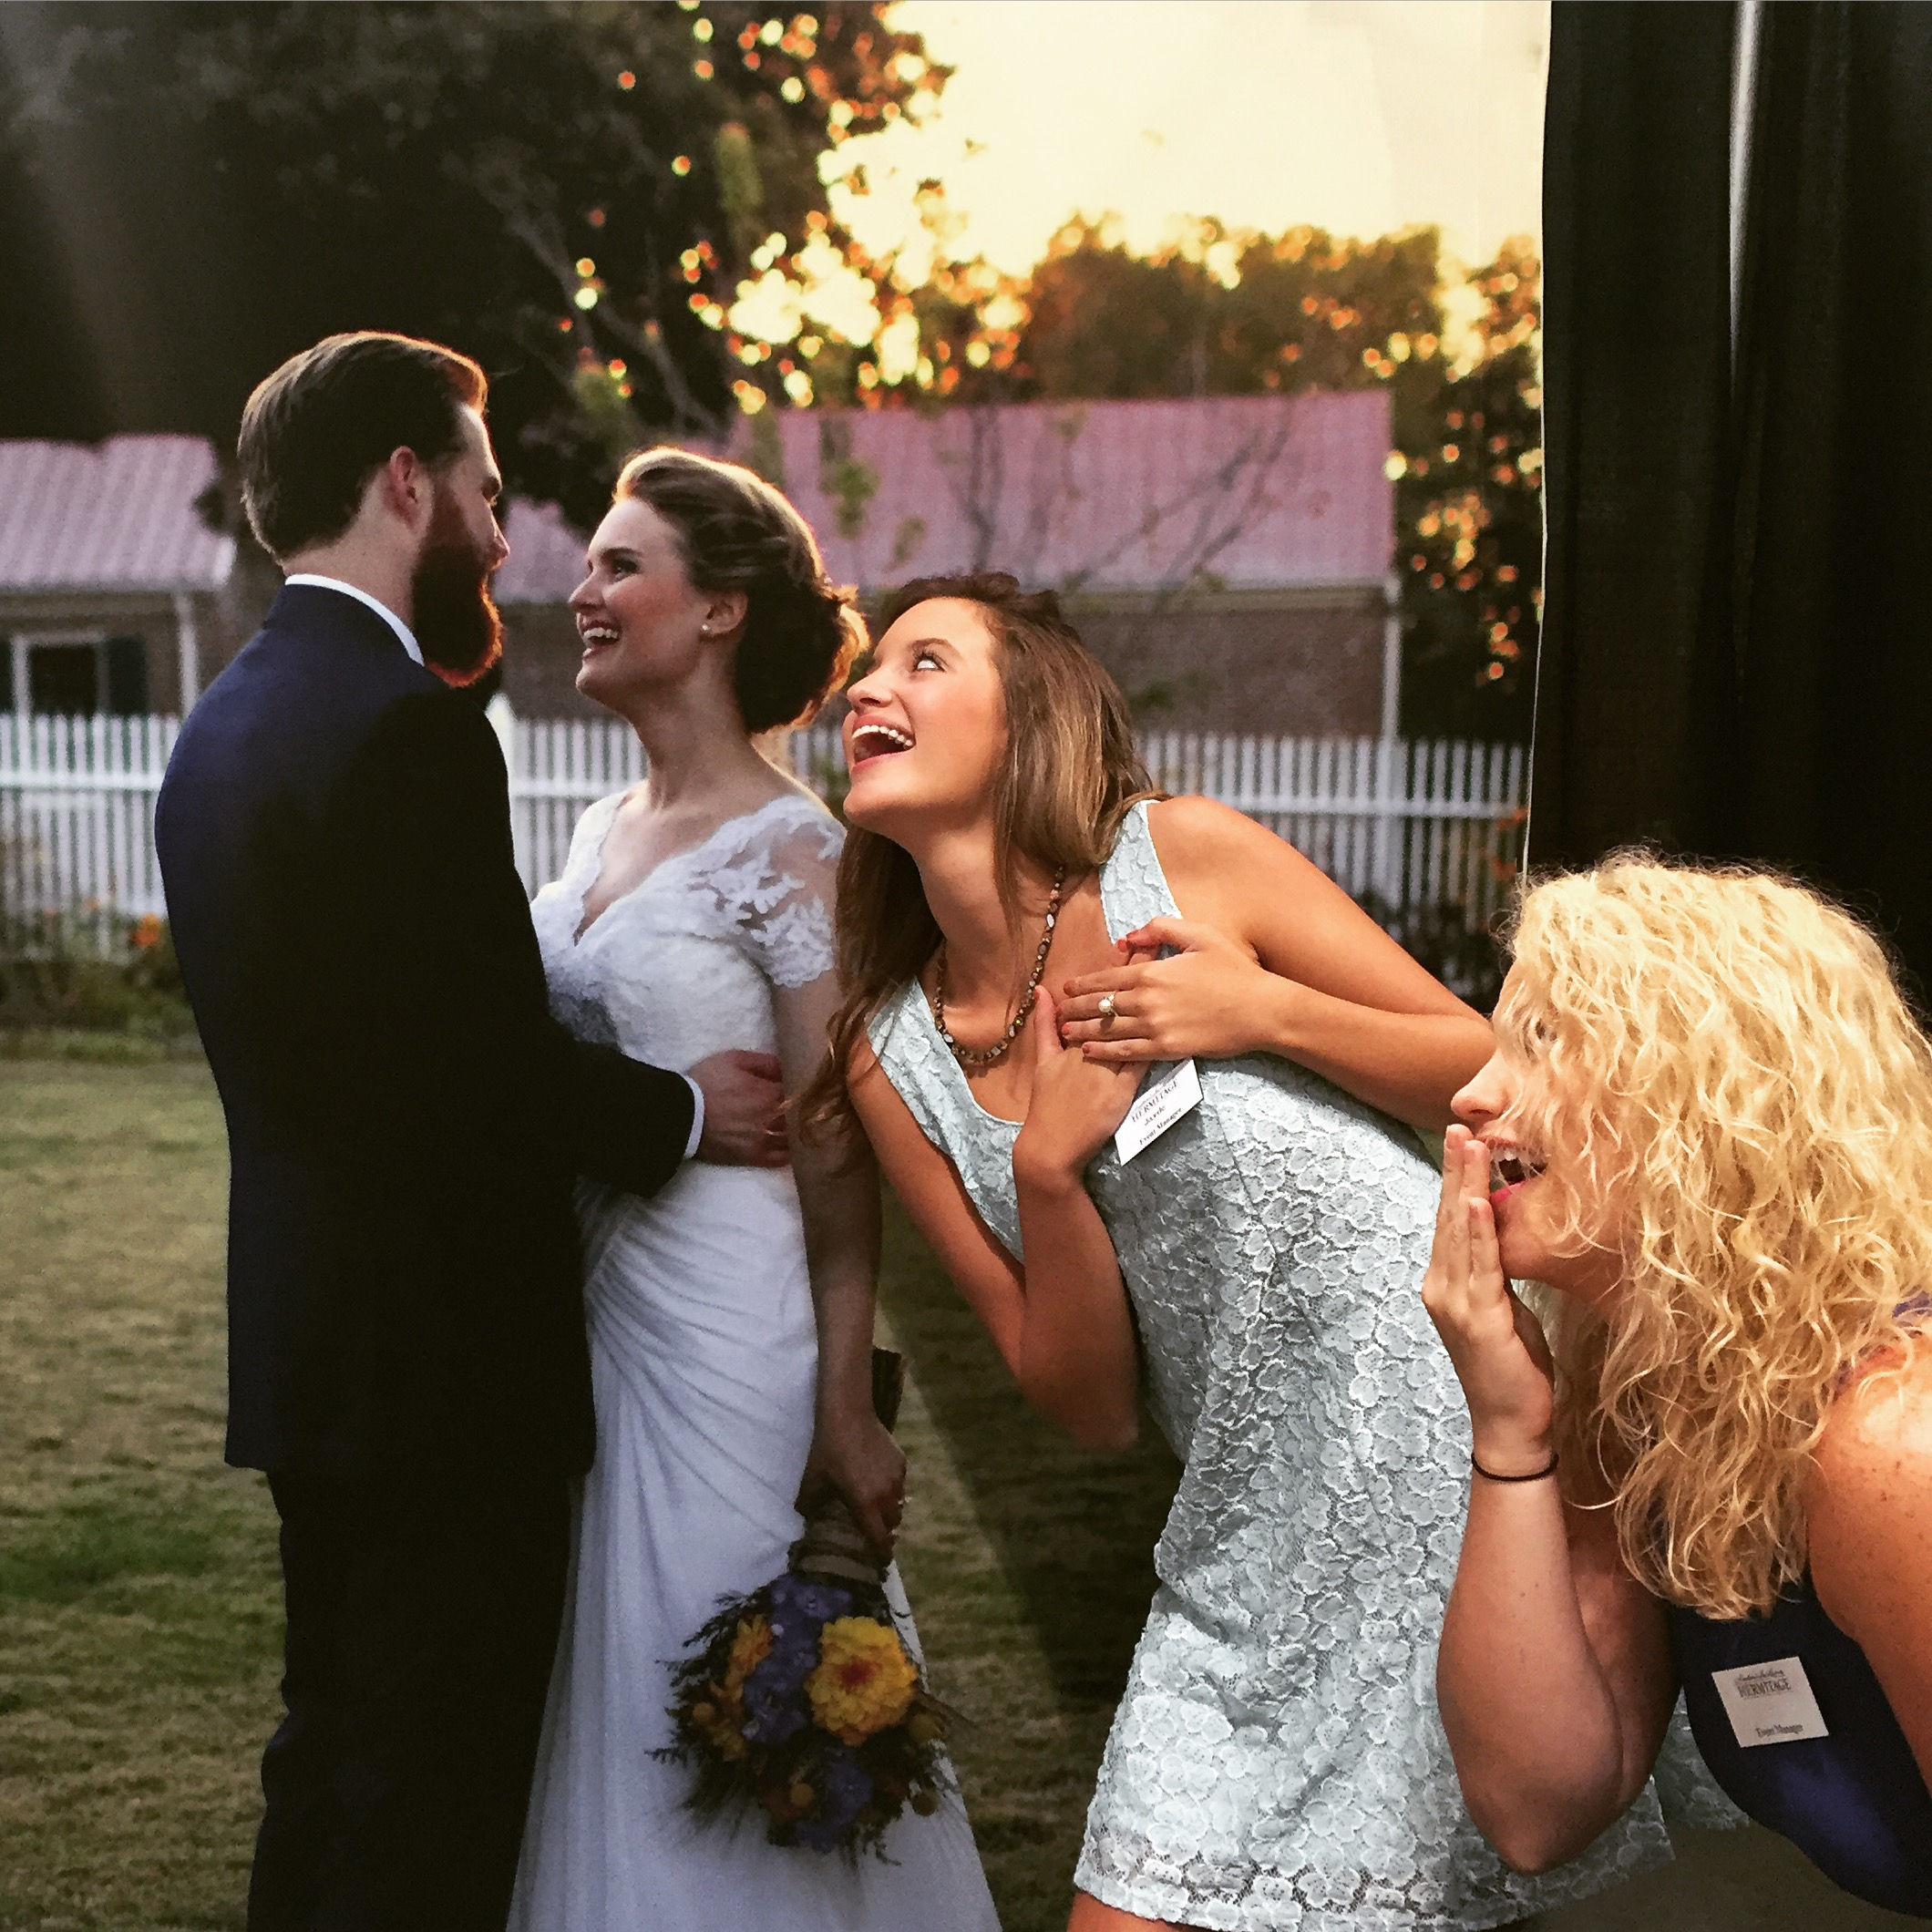 We loooove weddings, can't you tell?